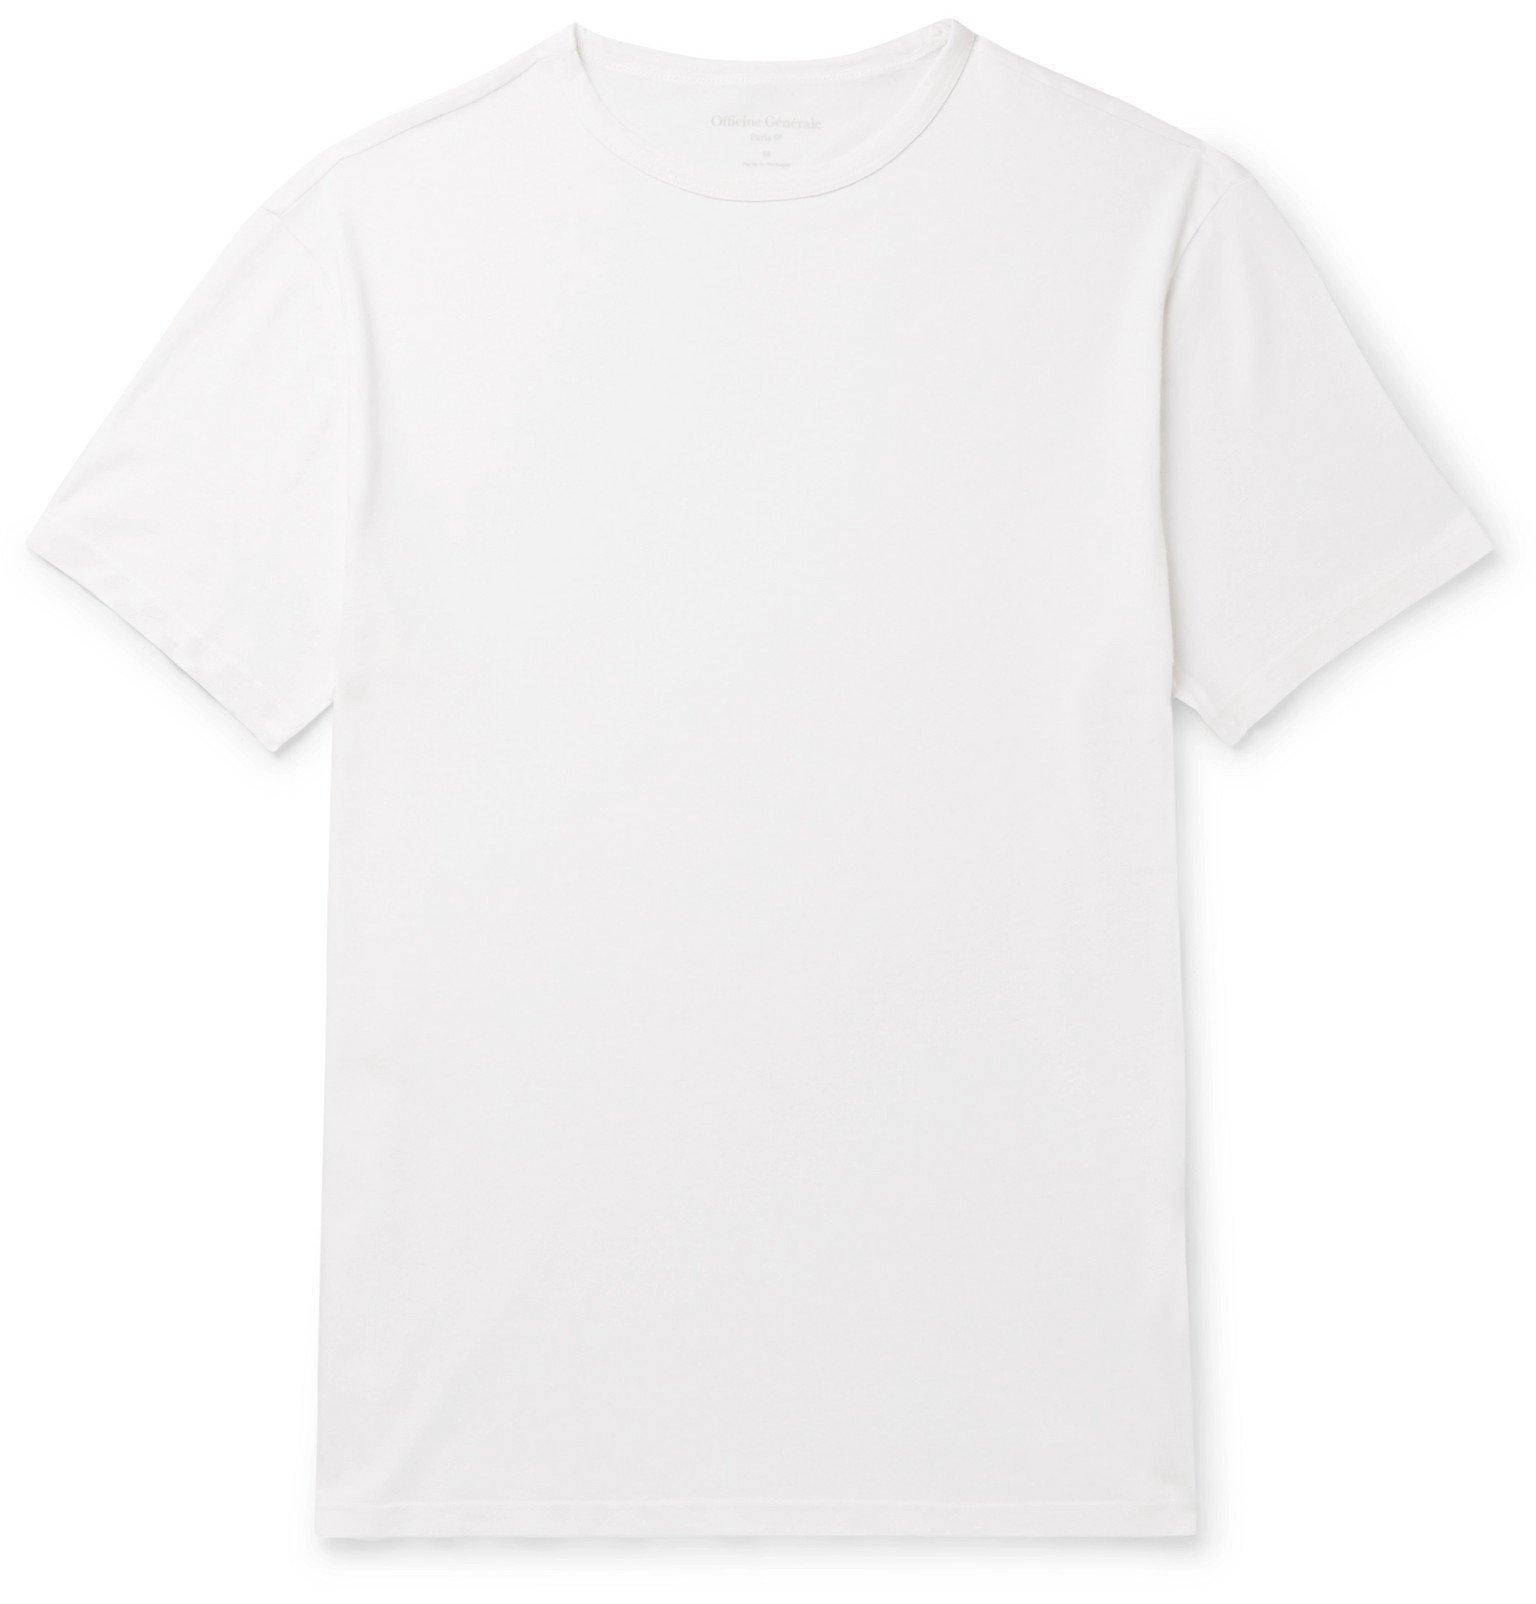 Officine Generale - Cotton-Jersey T-shirt - White